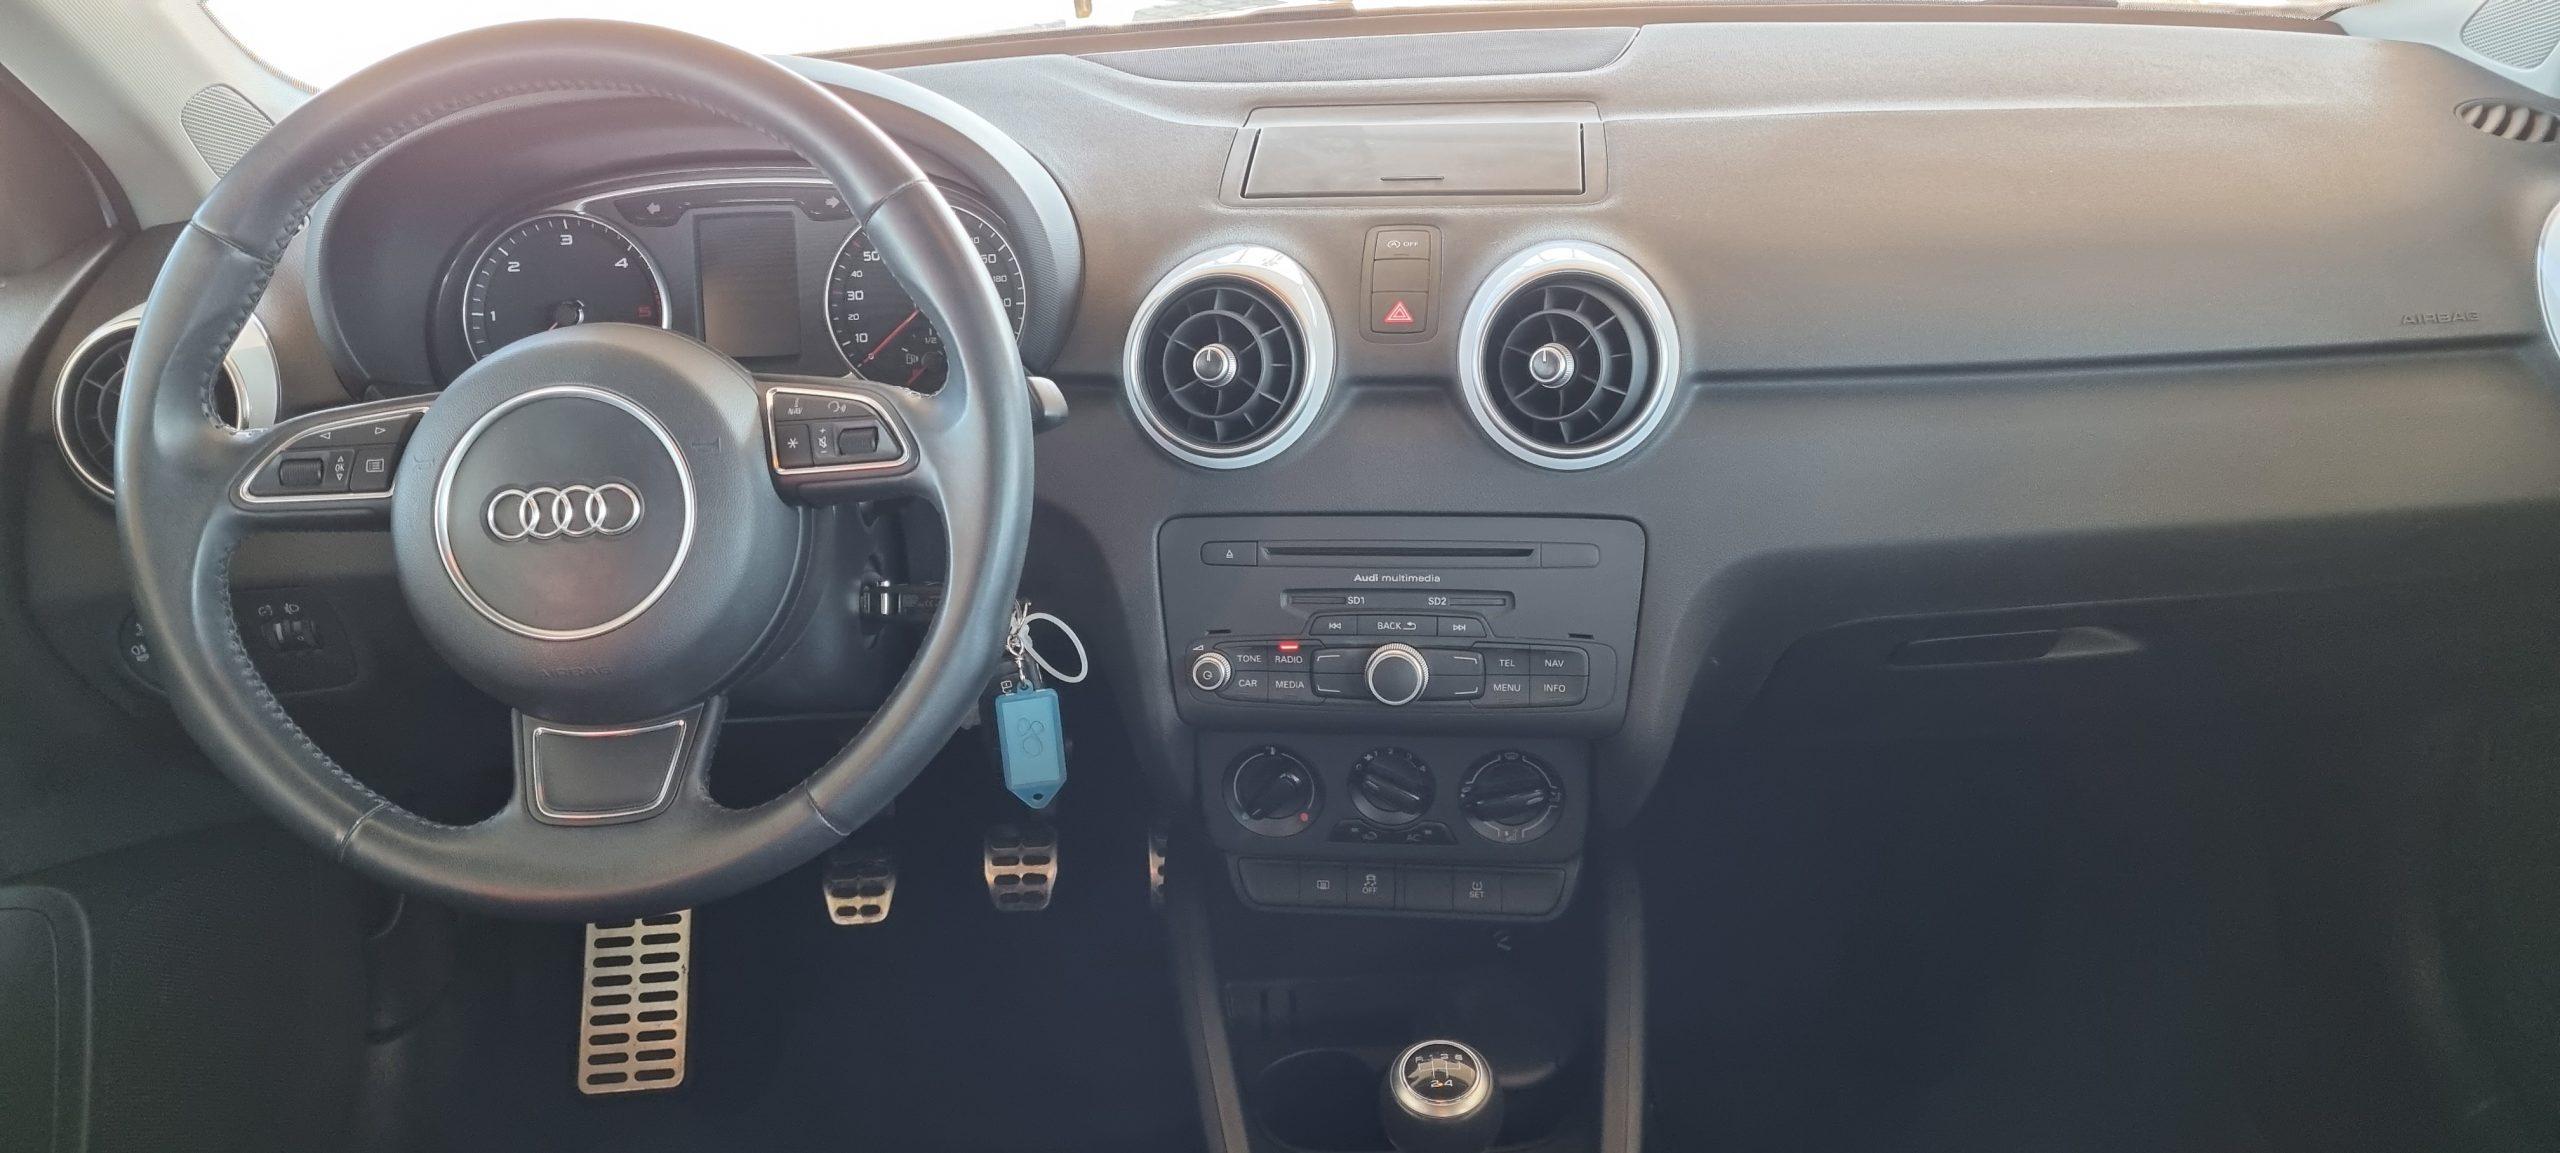 AUDI A1 SPB 1.6 Tdi S-Line Edition